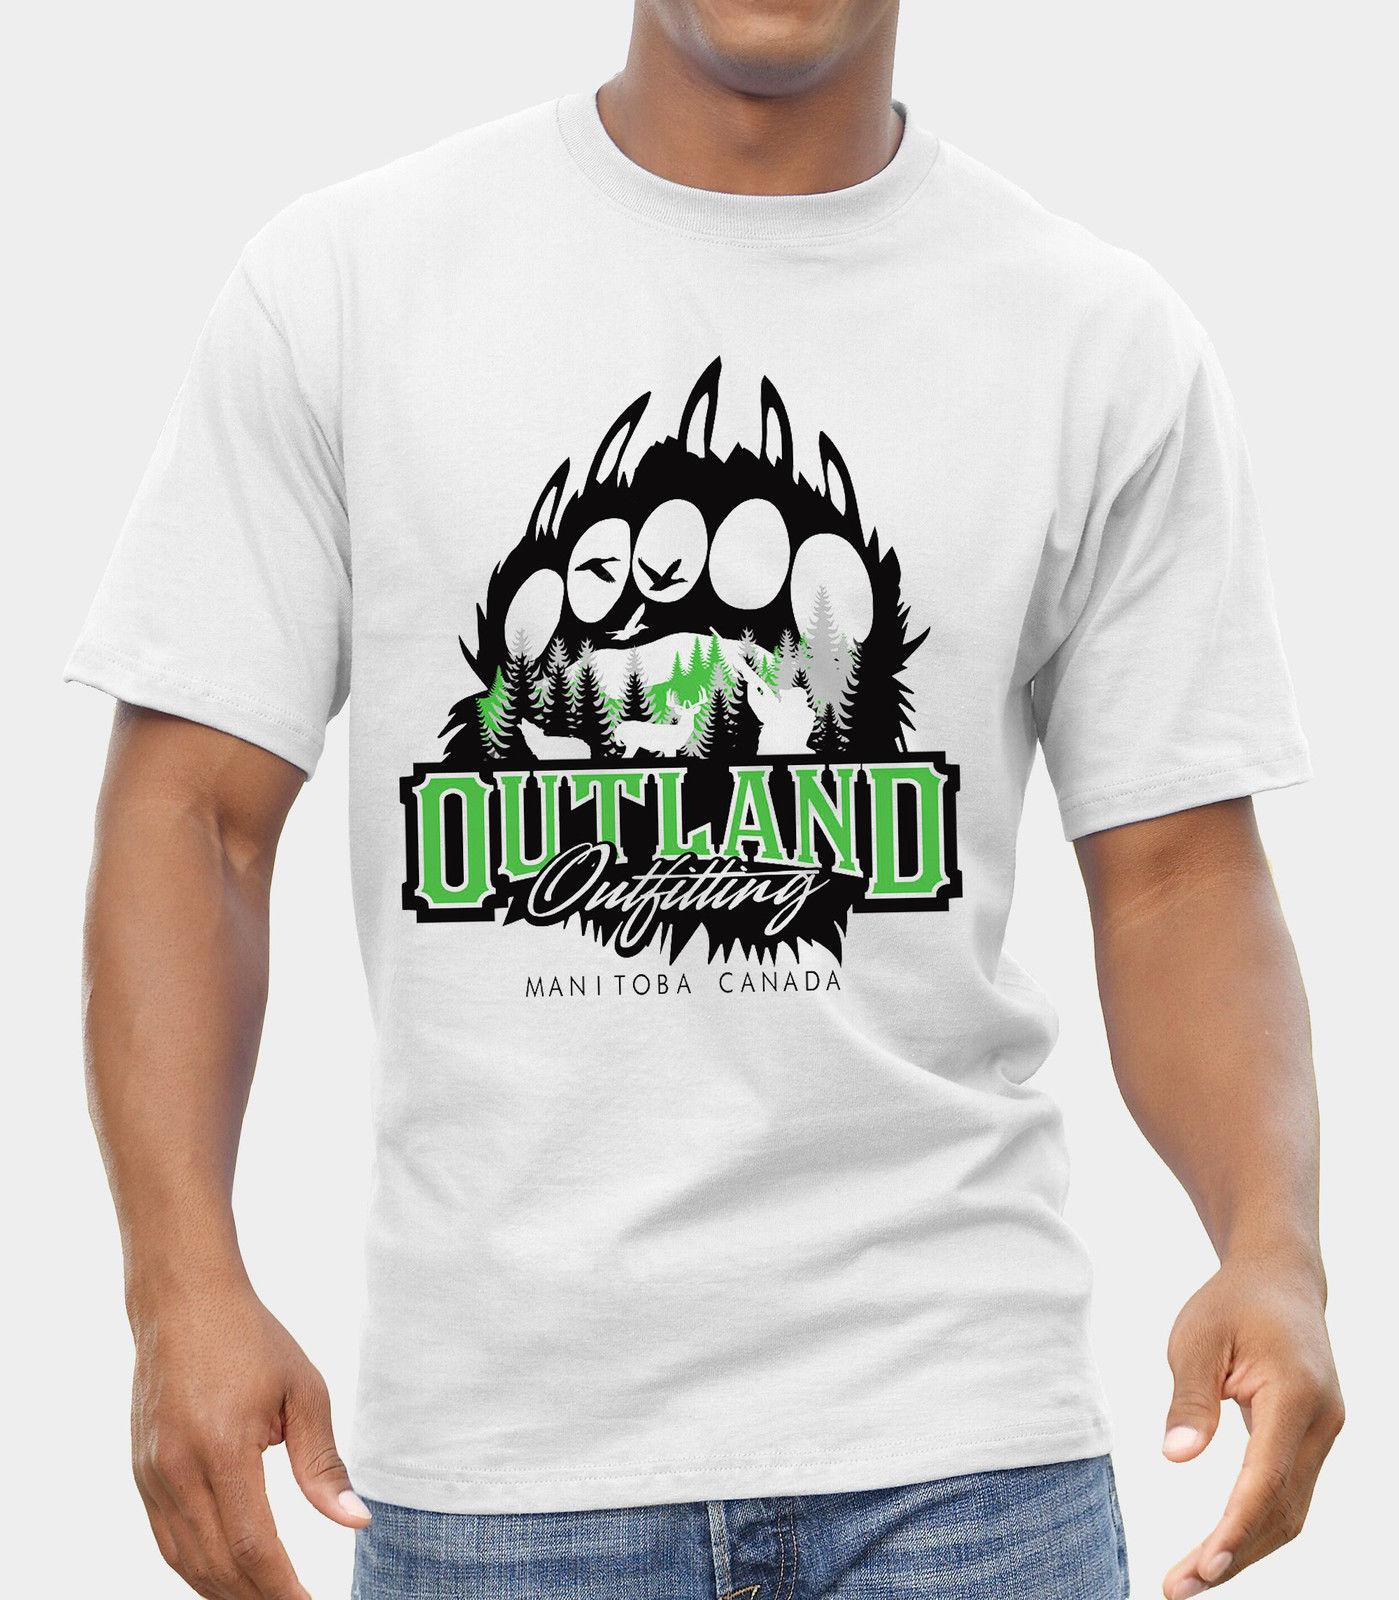 8731d243a Outland Outfitters Bear Deer Wolf Ducks Hunting Logo Design T Shirt S Xxl  100% Cotton Short Sleeve O Neck TTop Tee Basic 2018 New Brand Cool Tee  Designs ...